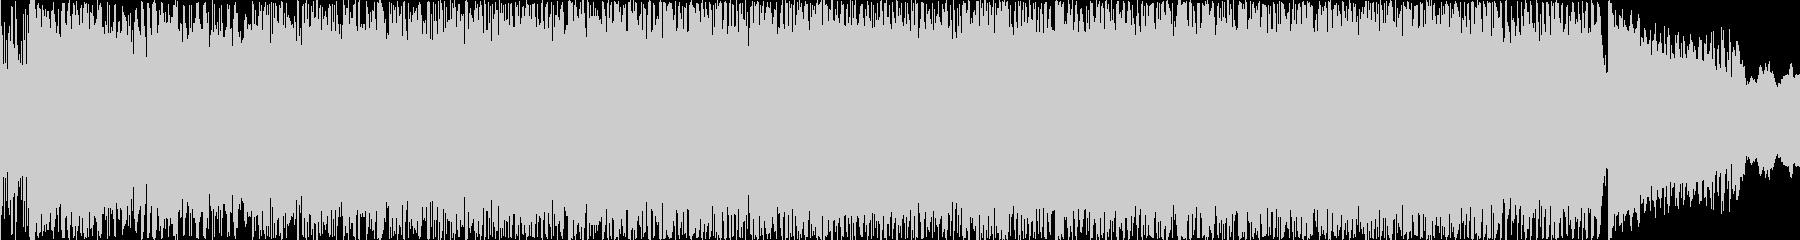 EDMとロックのBGMの未再生の波形